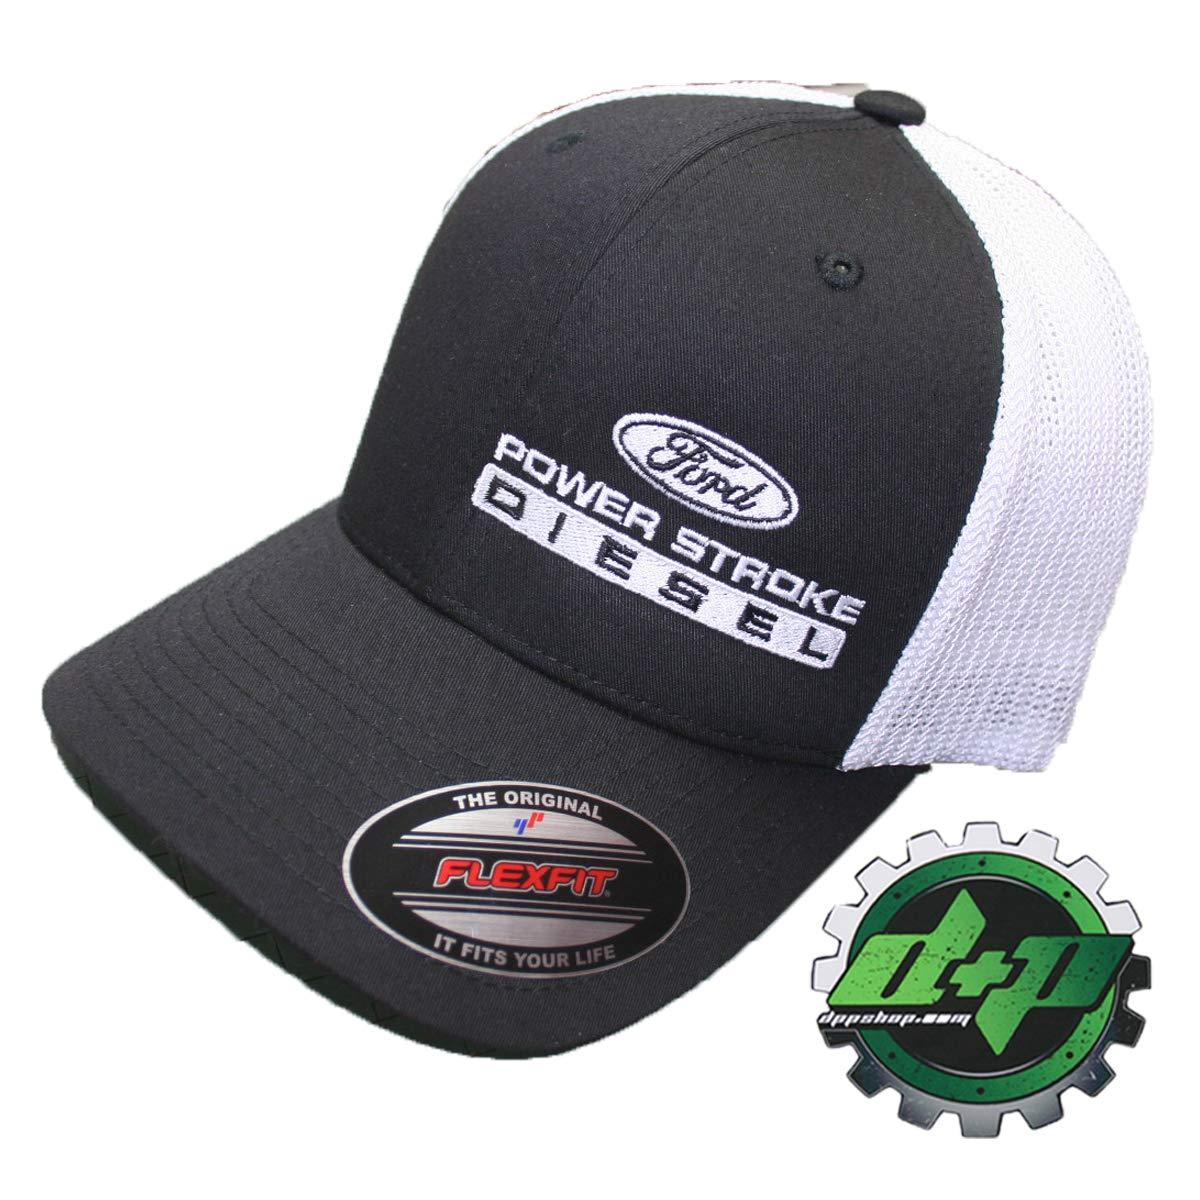 839ff8e6aad Amazon.com: Flexfit Fitted Ford Powerstroke Trucker Ball Cap hat Diesel  Truck Gear Flex fit Offset: Sports & Outdoors